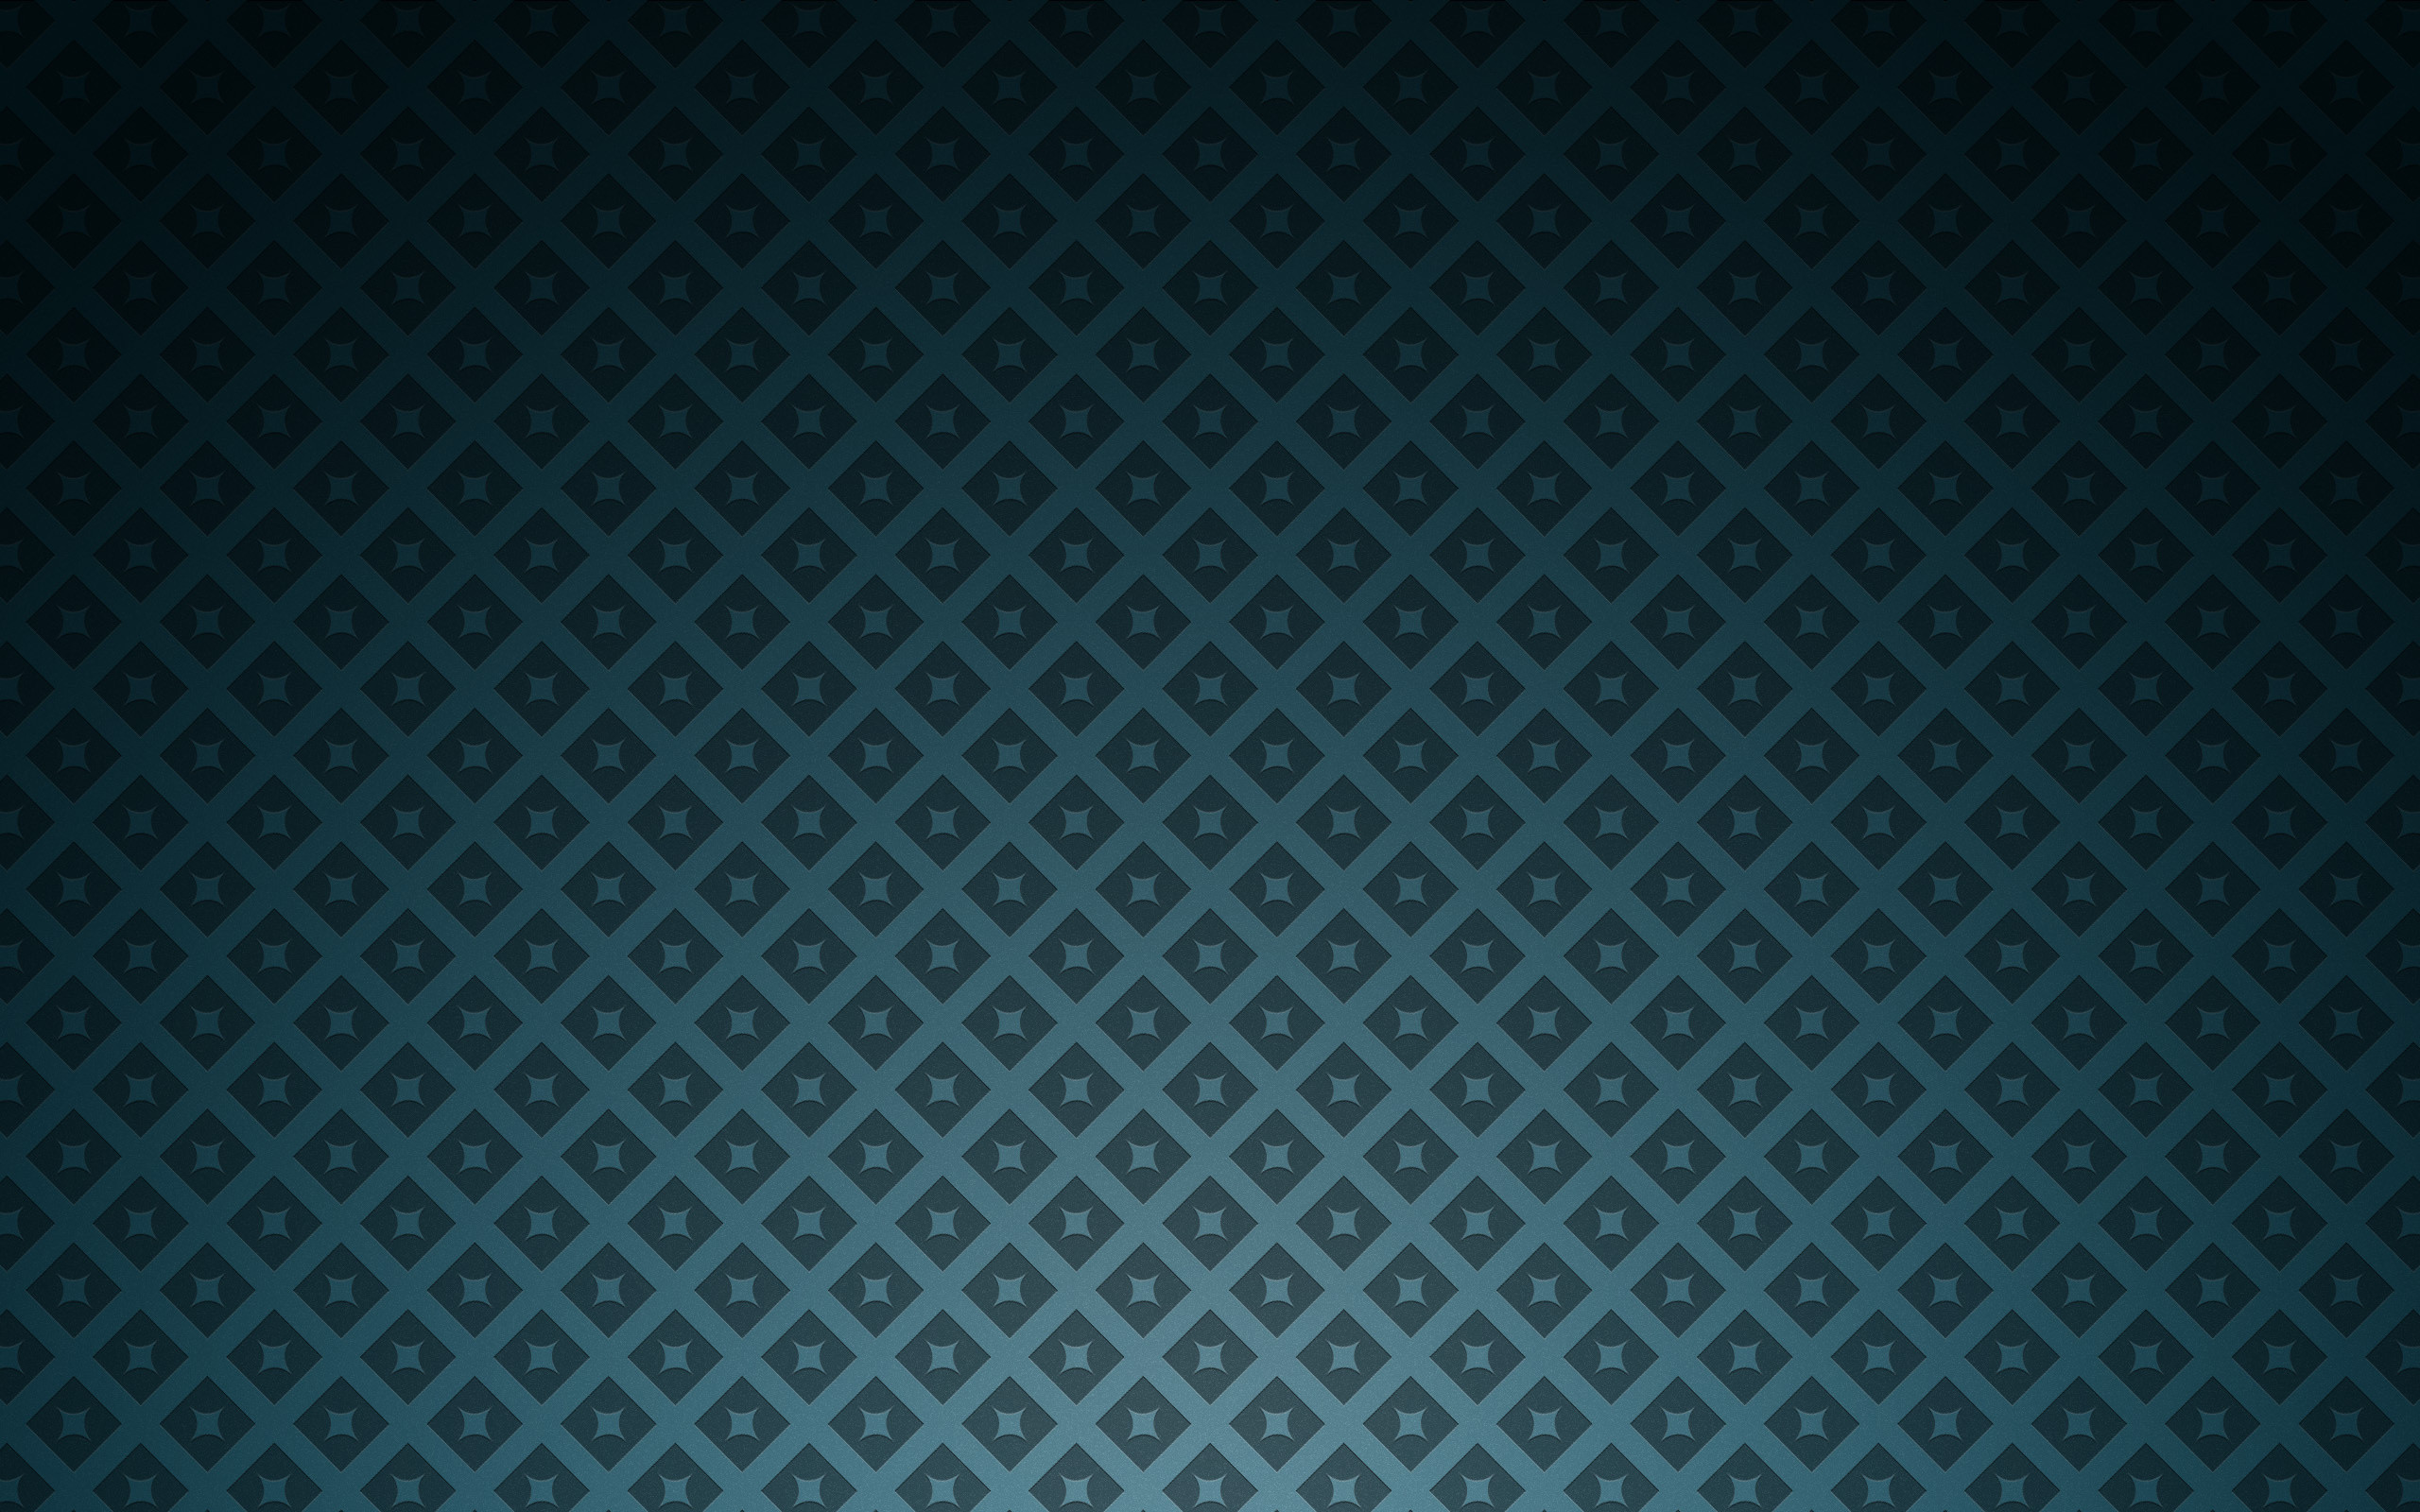 wallpaper.wiki-Vintage-backgrounds-wallpaper-hd-PIC-WPD0013544